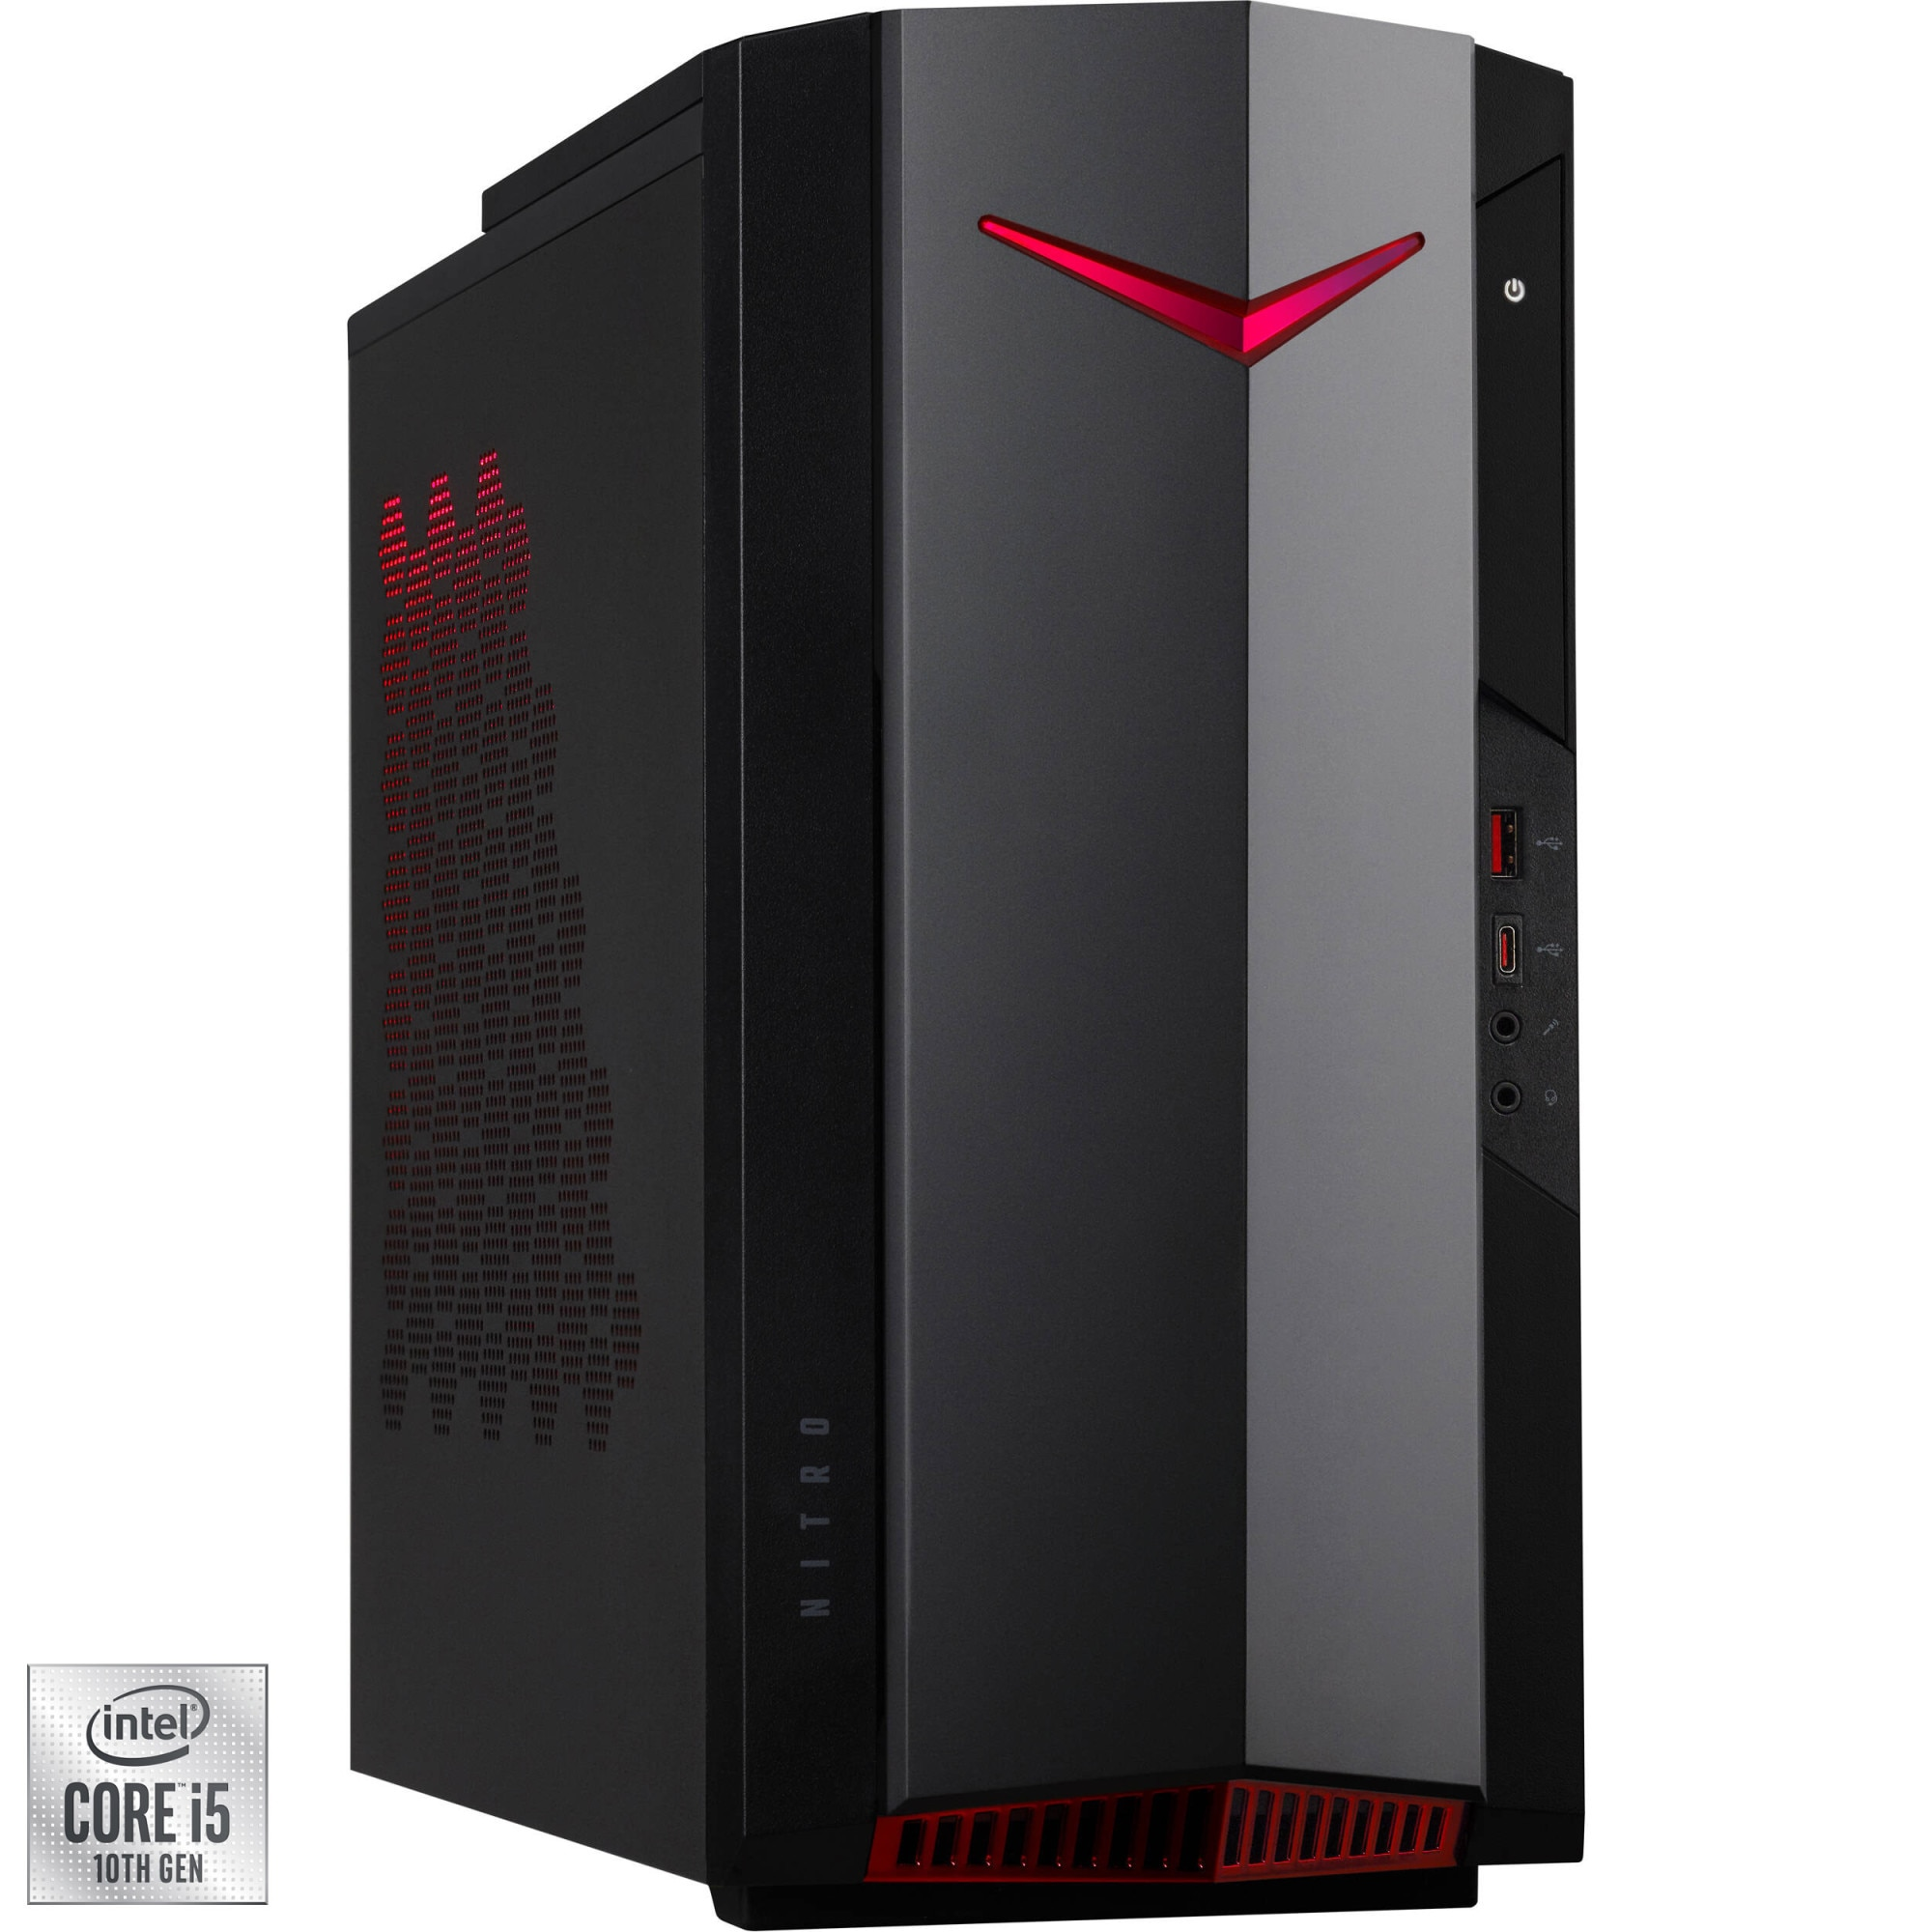 Fotografie Sistem Gaming Acer Nitro N50-610 cu procesor Intel® Core™ i5-10400F pana la 4.30 GHz, Comet Lake, 16GB DDR4, 512GB SSD, NVIDIA GeForce GTX 1660 SUPER 6GB, Endless OS